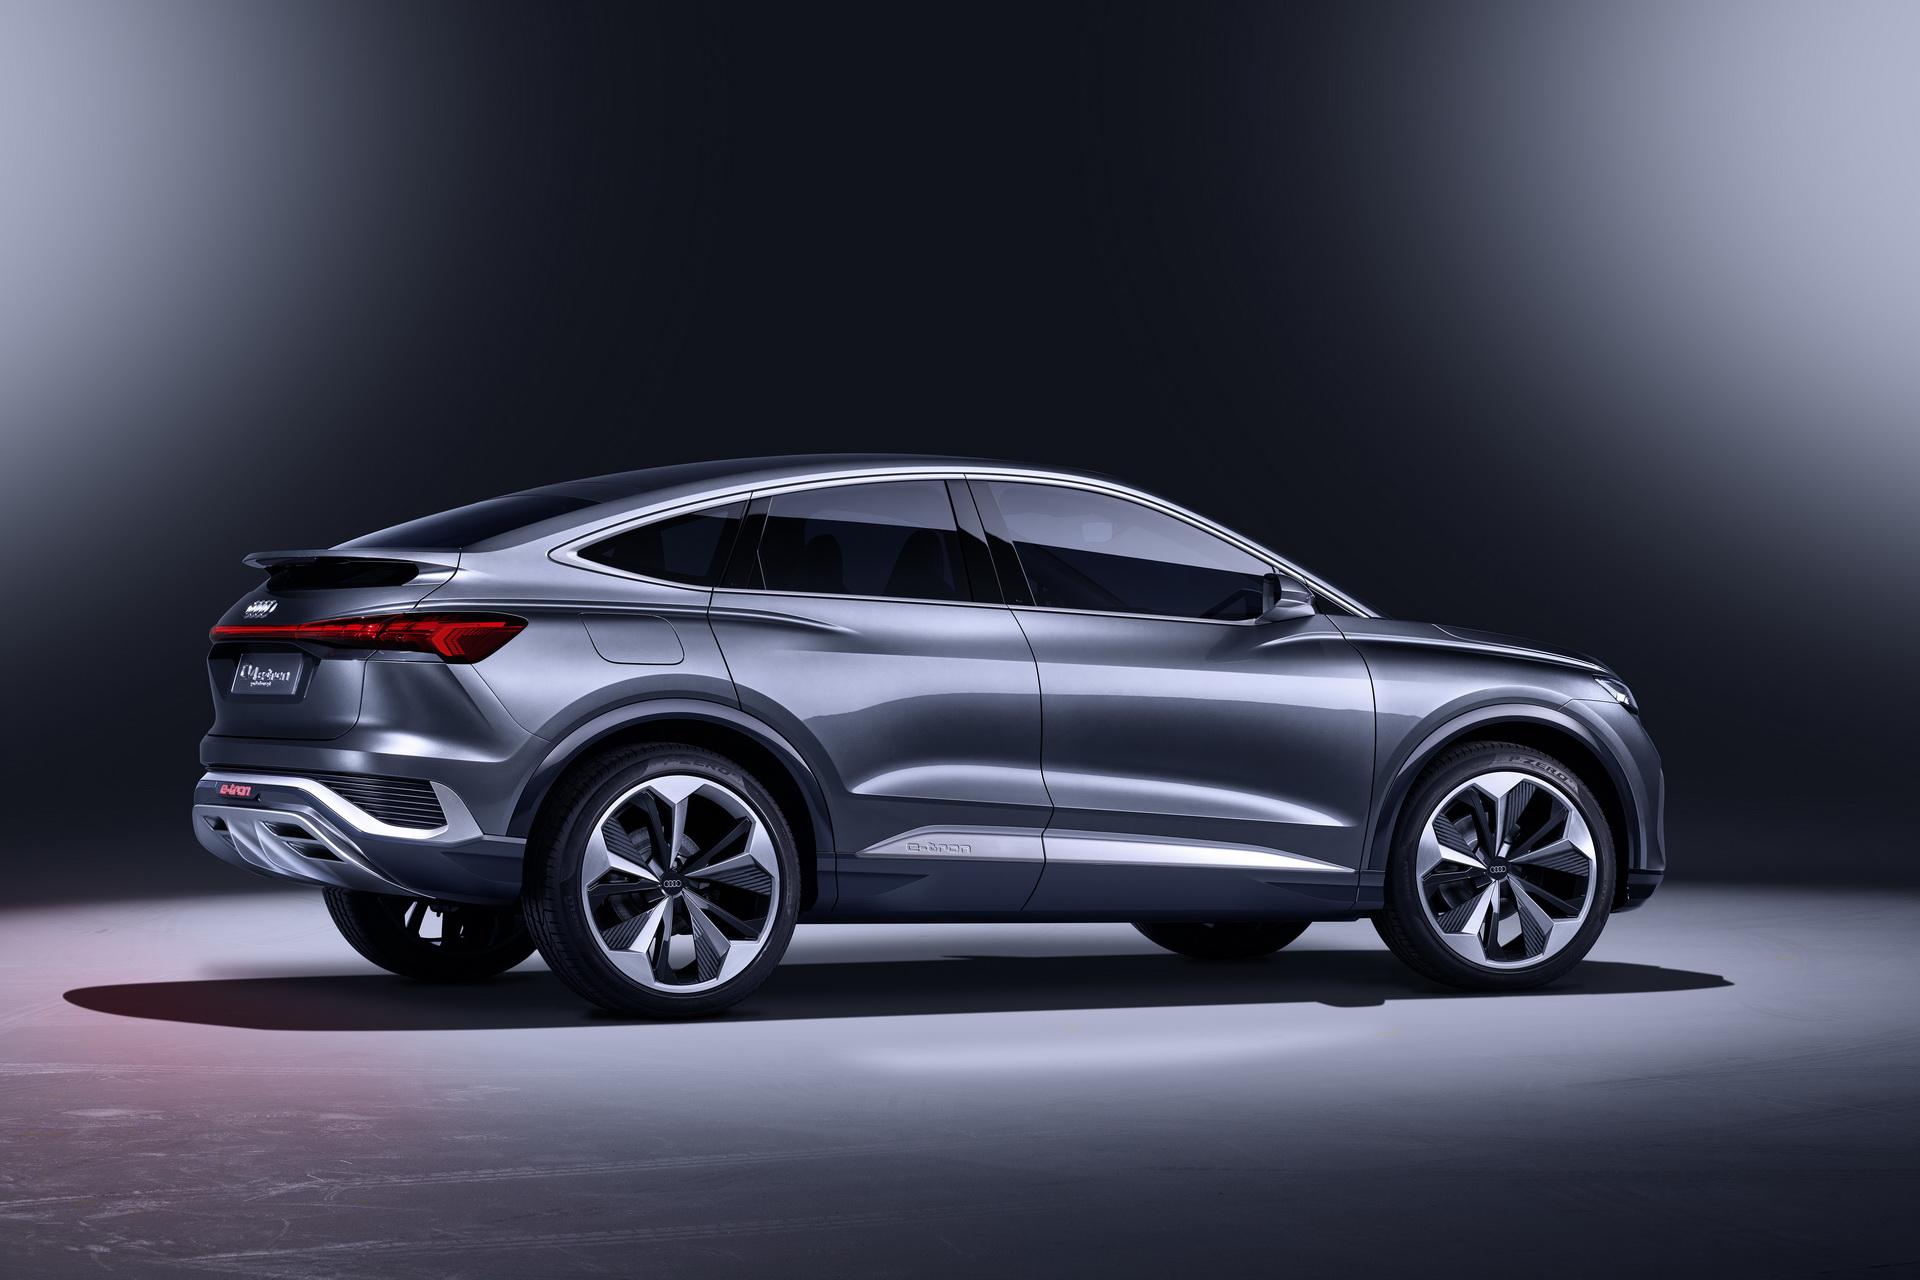 Audi-Q4-e-tron-Sportback-Concept-11